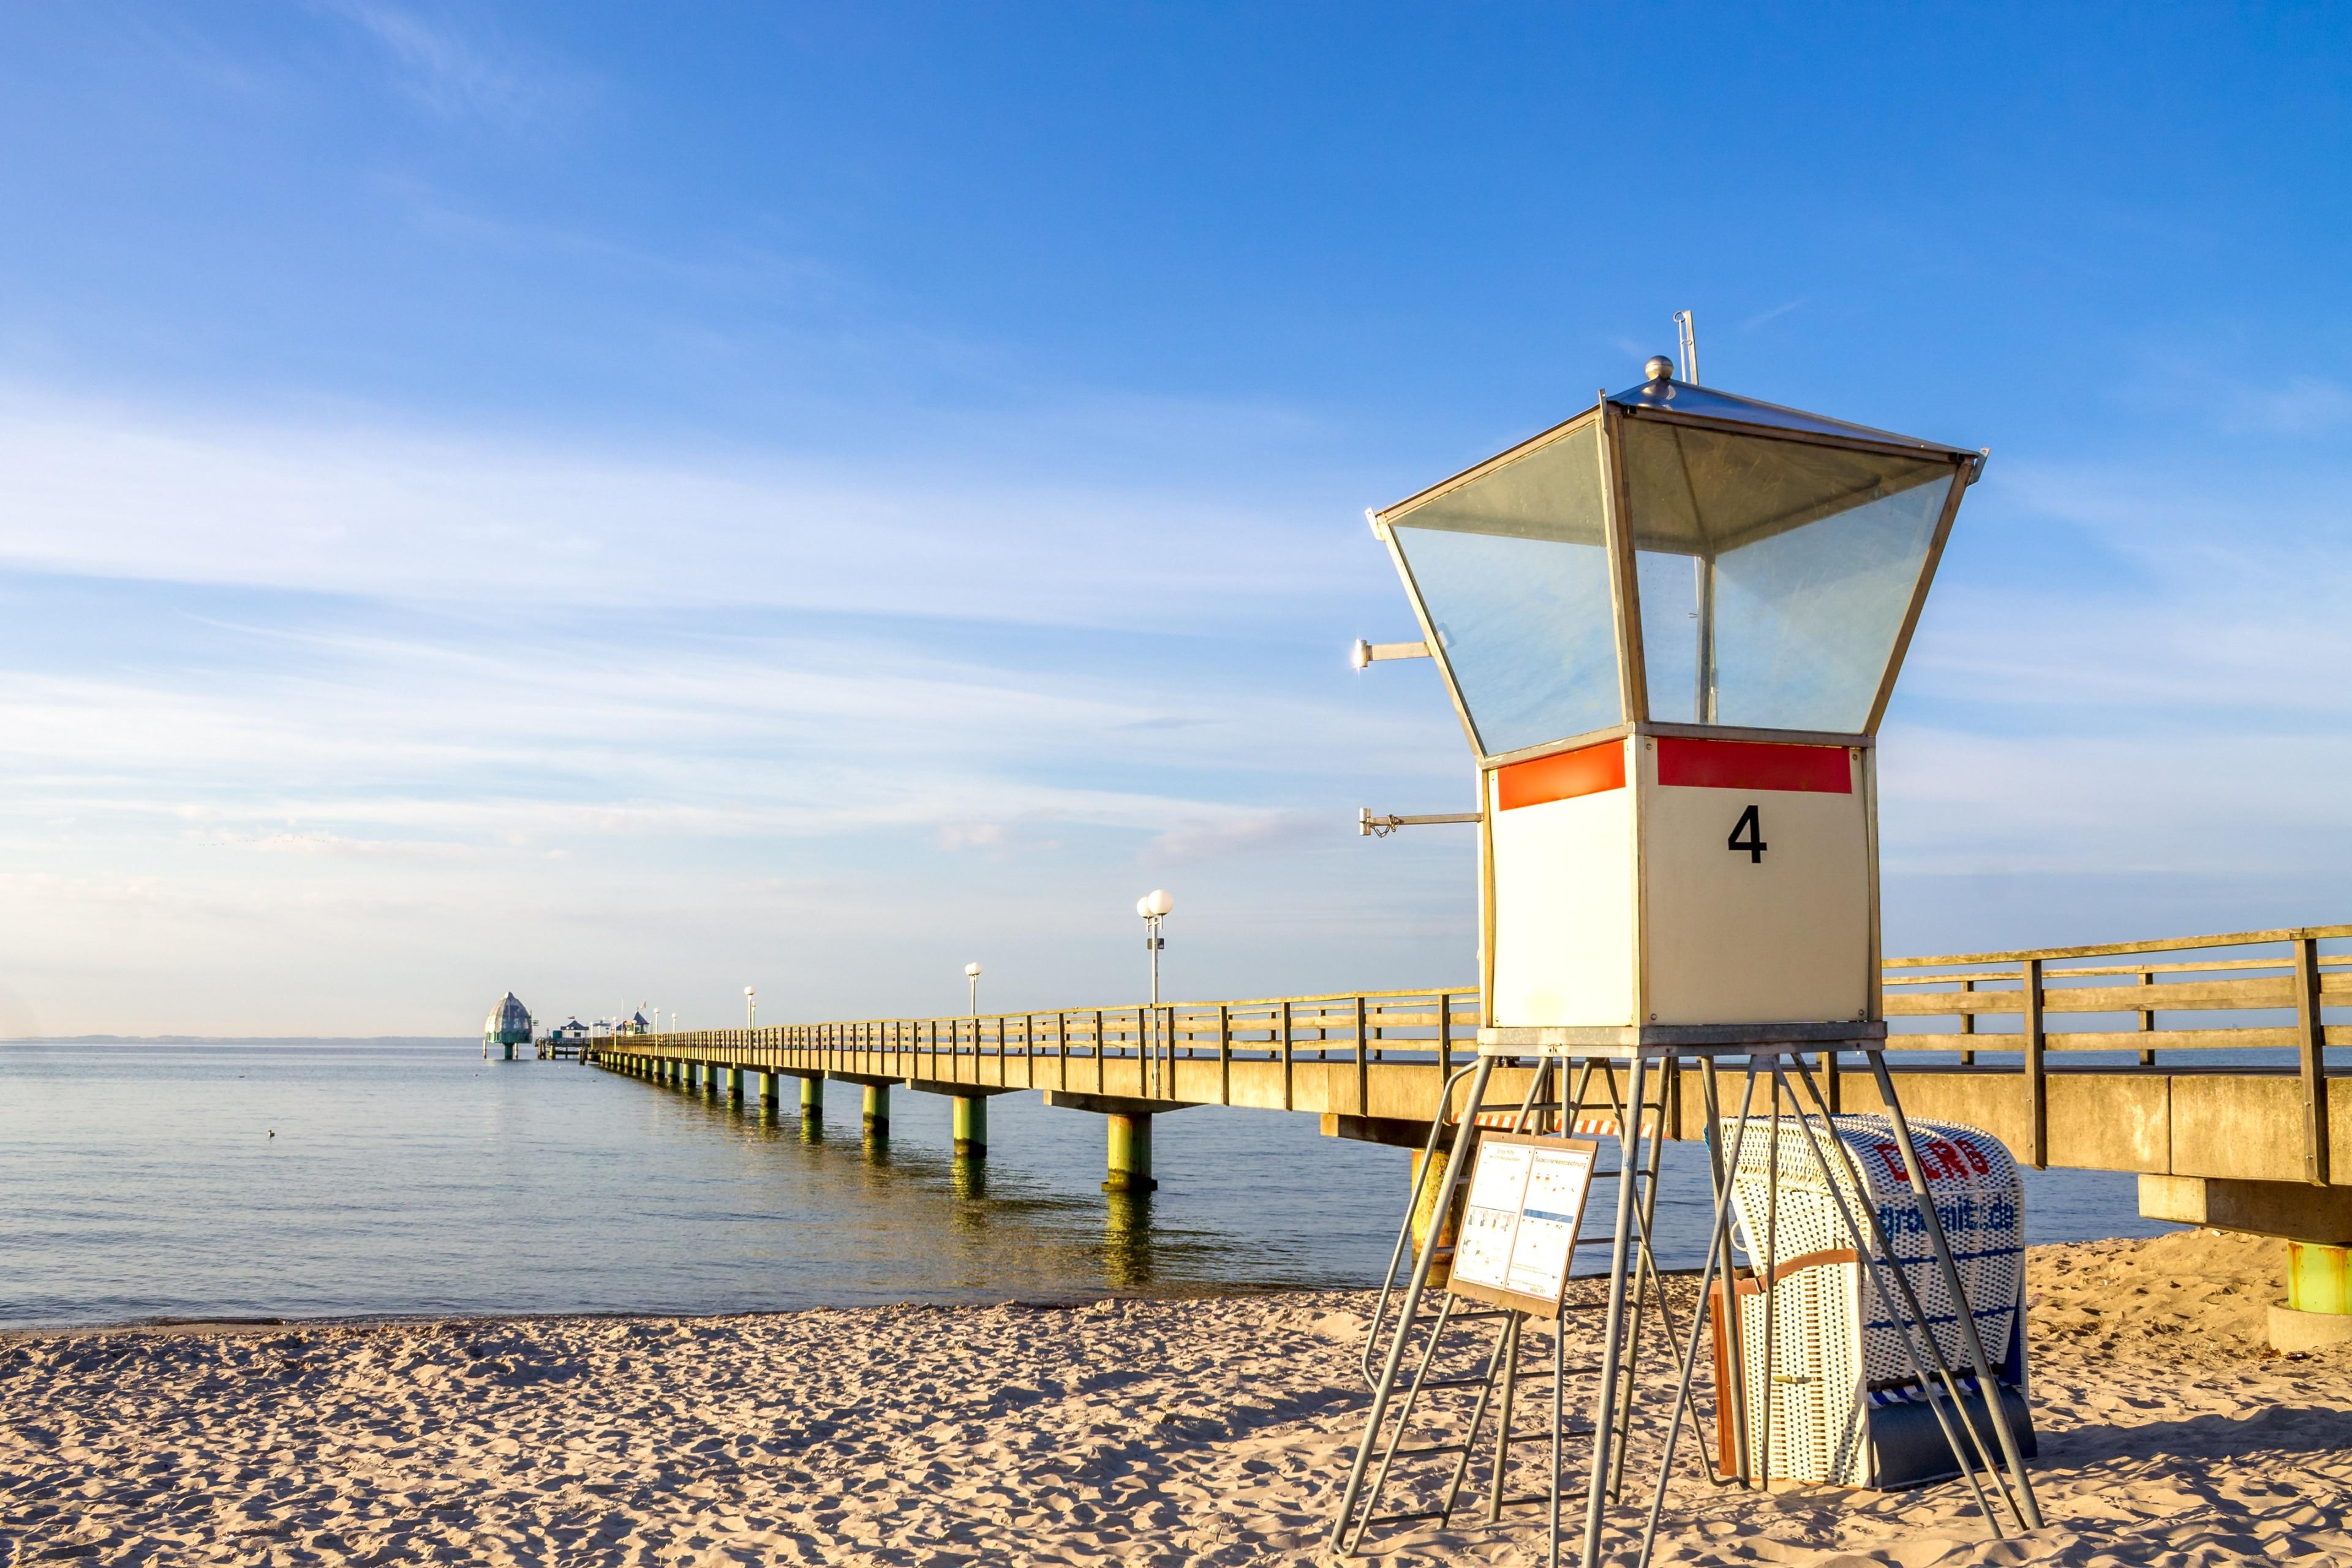 Groemitz, Schleswig-Holstein, Germany